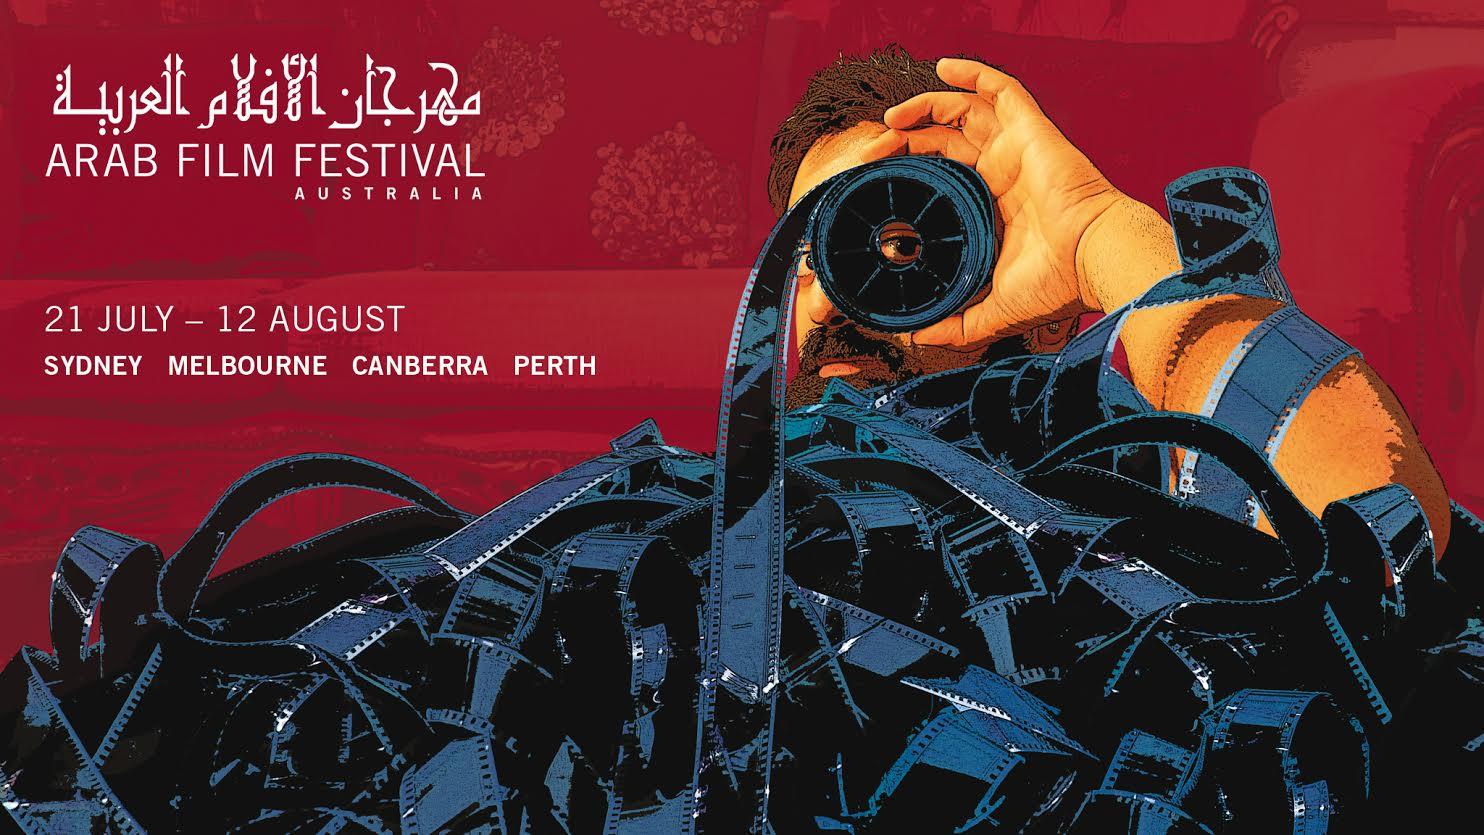 Arab Film Festival Melbourne